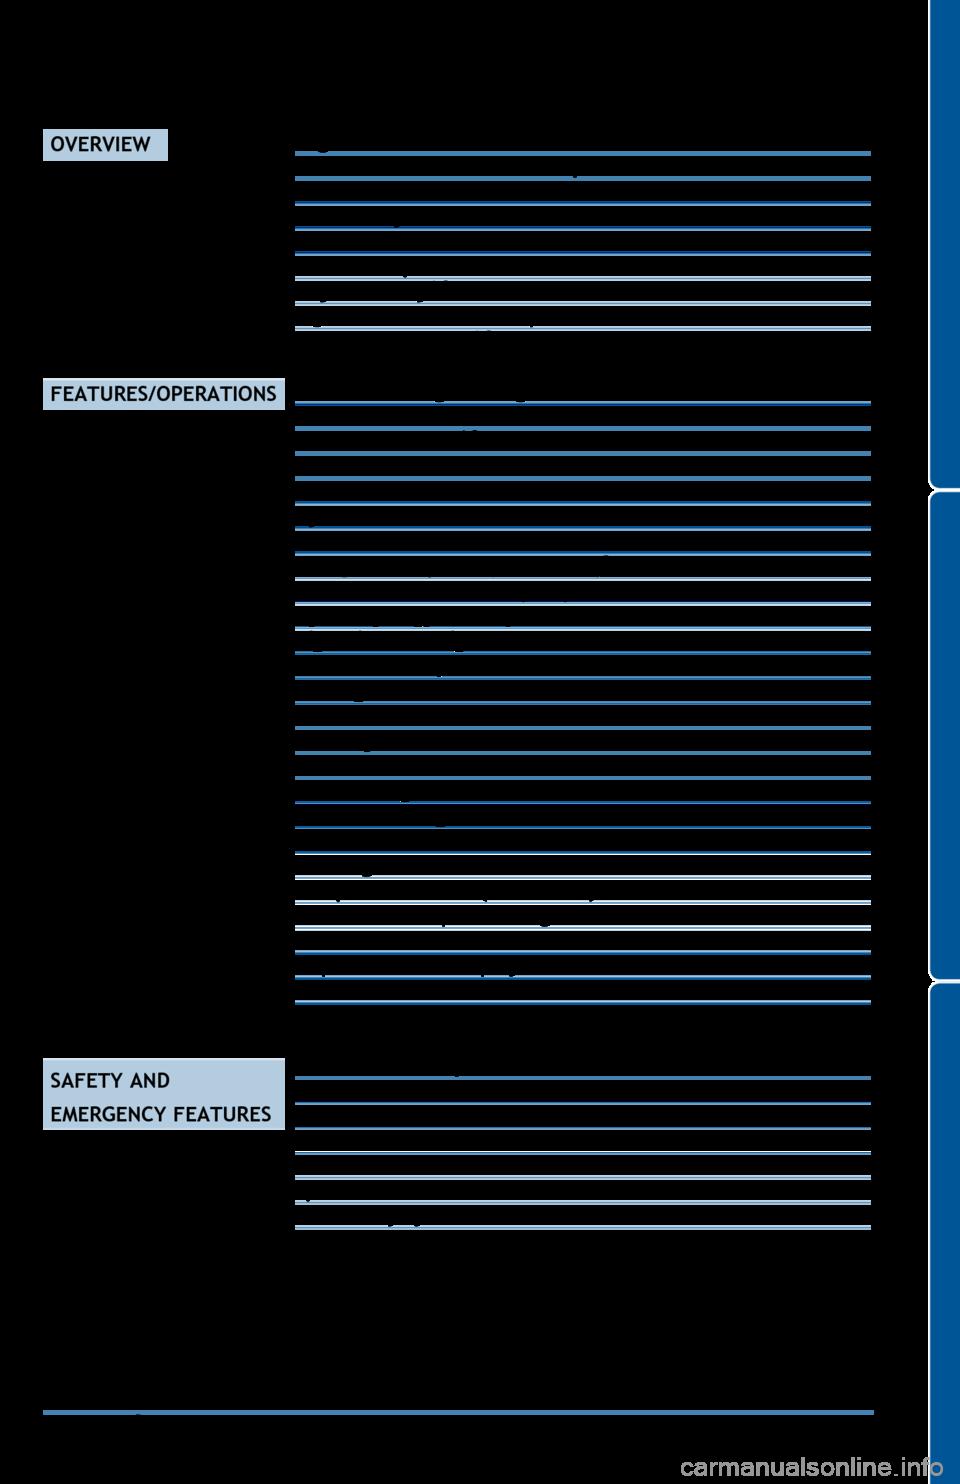 Toyota rav4 dashboard symbols choice image symbol and sign ideas toyota echo dashboard symbols image collections symbol and sign toyota prius v 2014 zvw40 1g quick buycottarizona